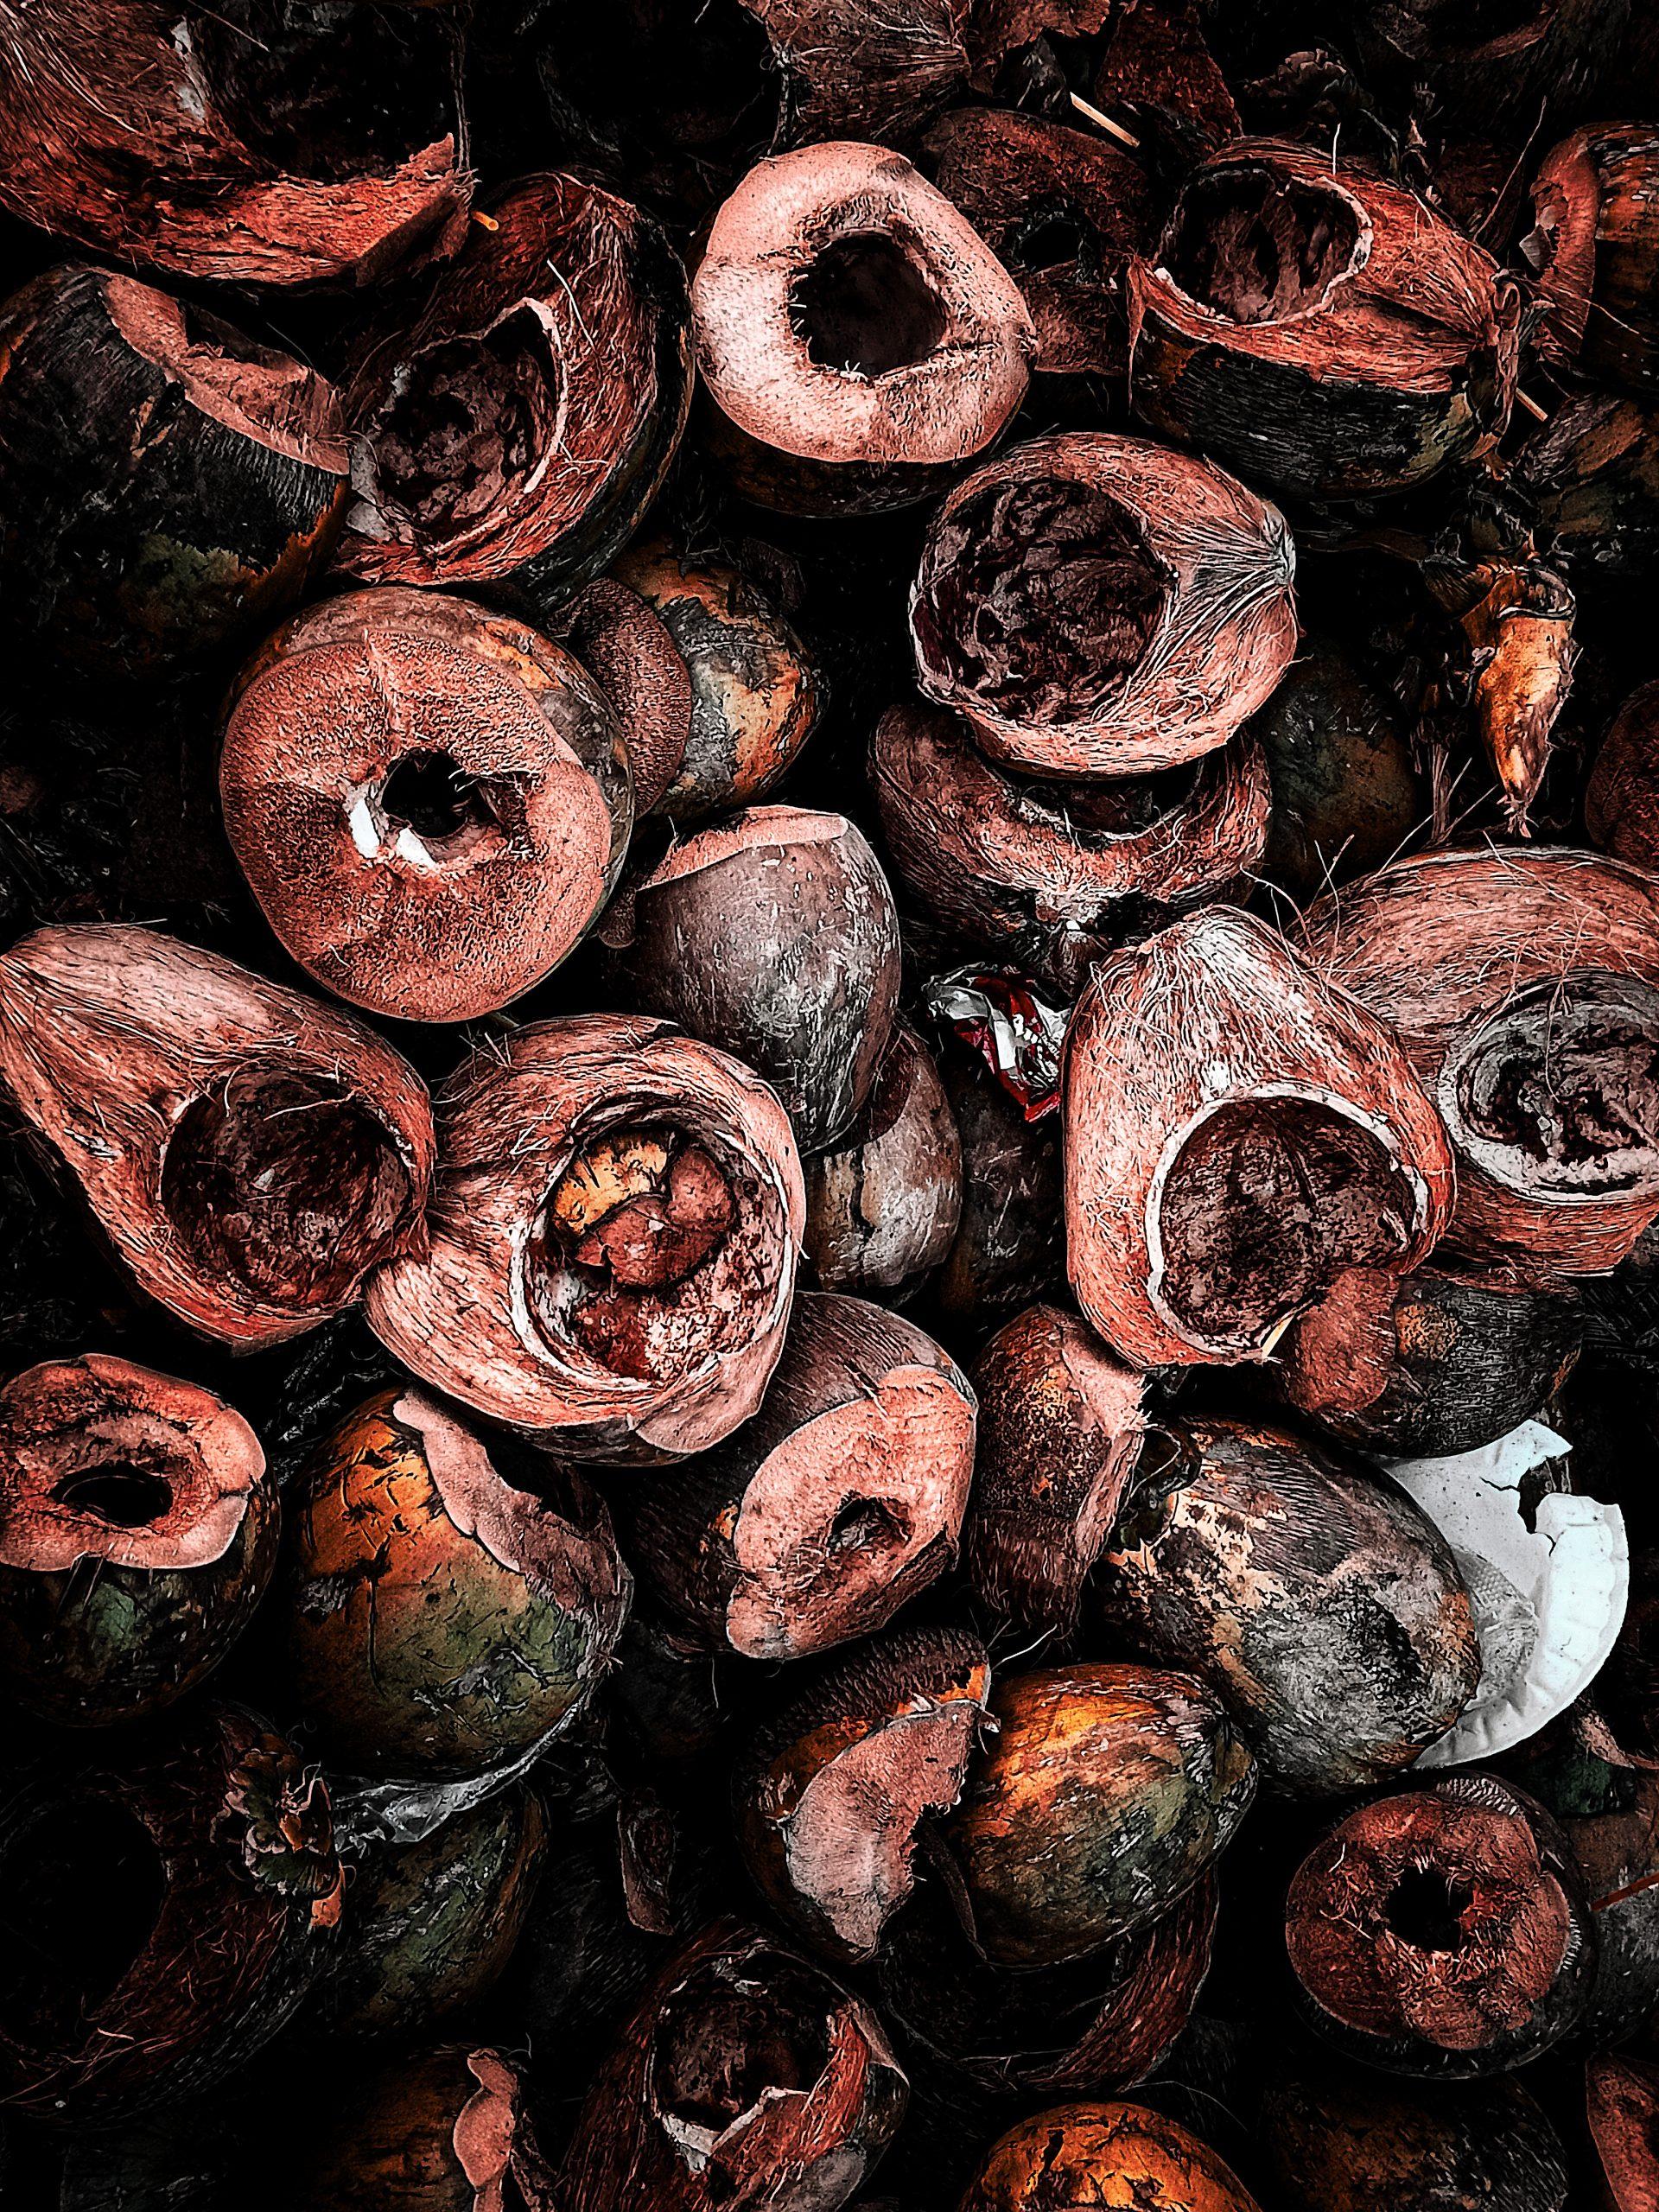 Waste coconut shells